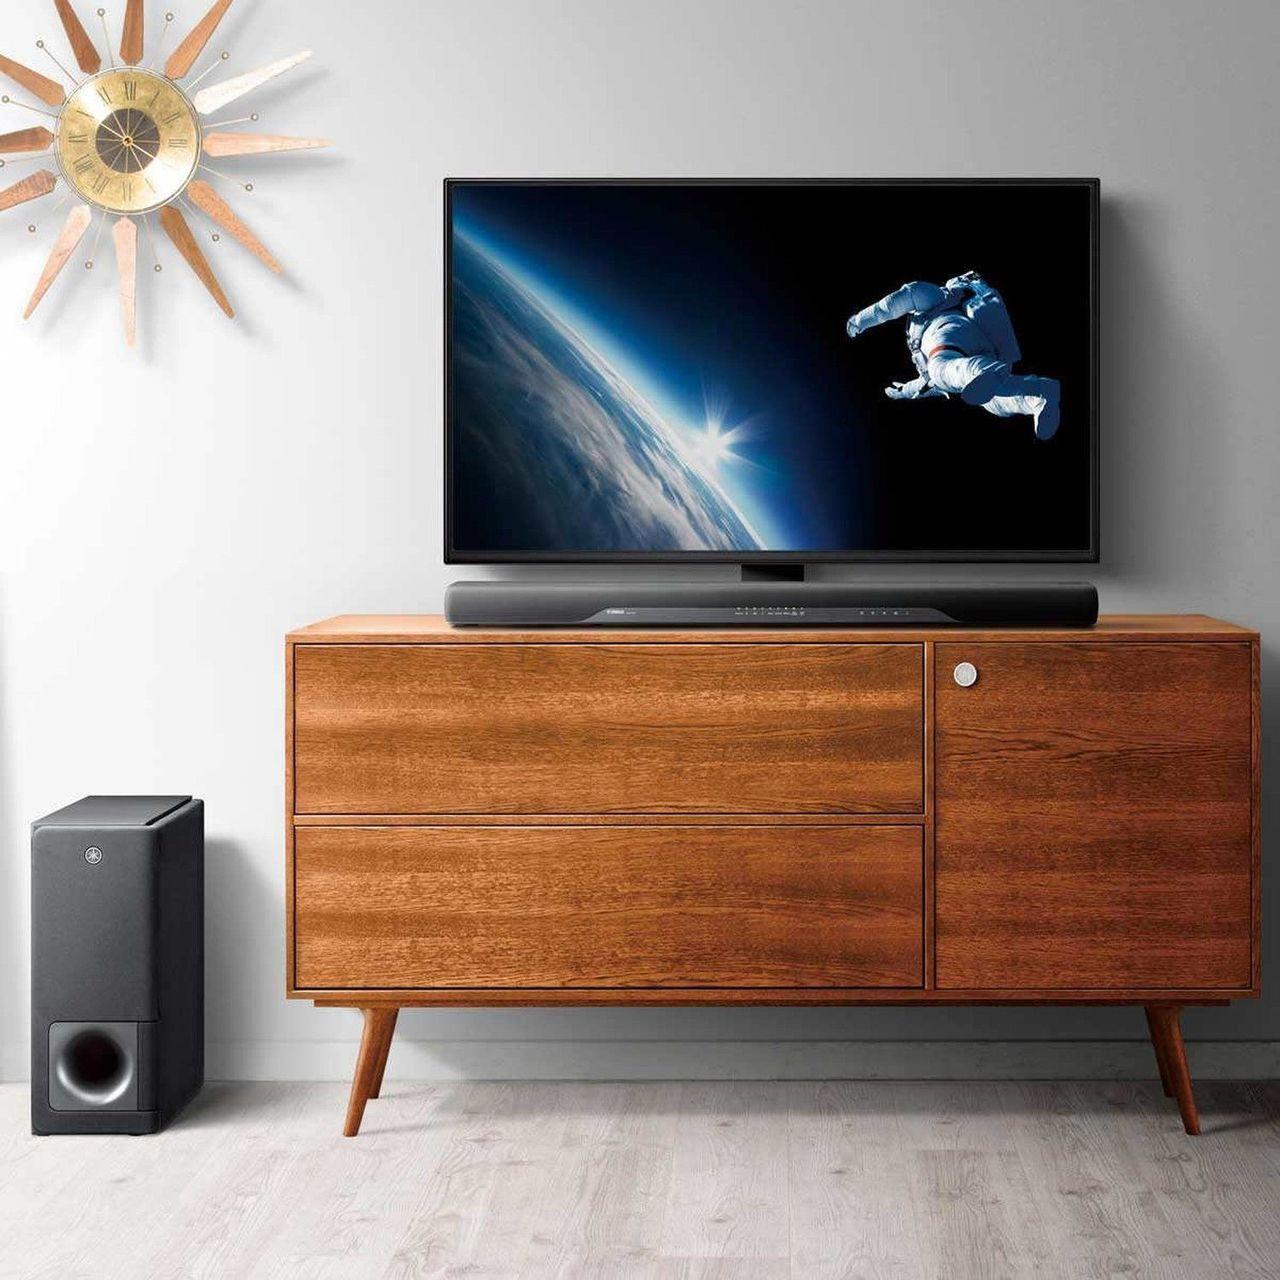 "Yamaha ATS-2070R 200W Total Power 36"" 2.1 Channel Soundbar with Wireless Subwoofer – Refurbished"